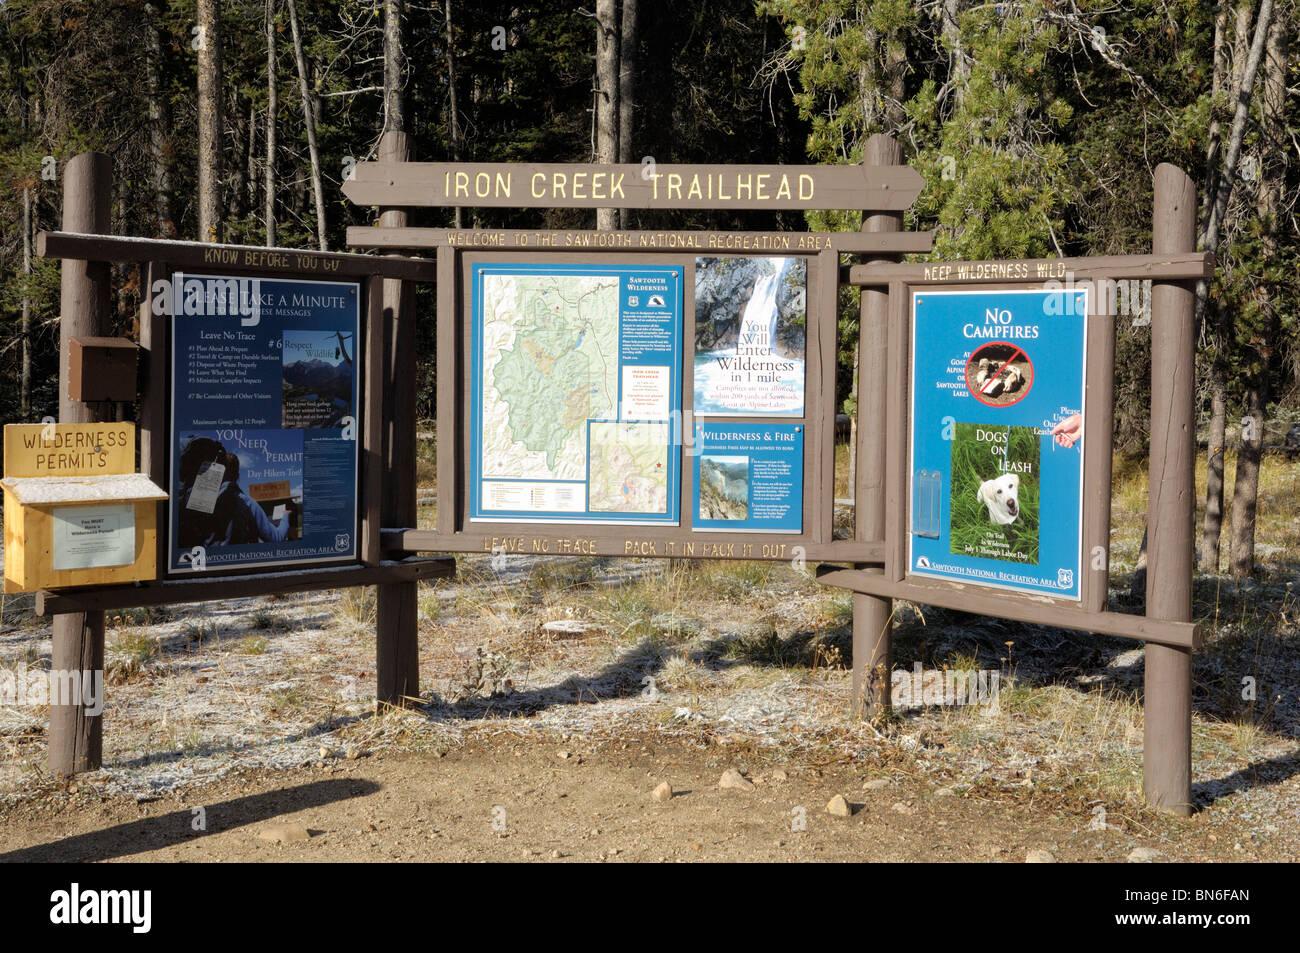 Iron Creek Trailhead notice board, Sawtooth Mountains, Idaho, USA - Stock Image